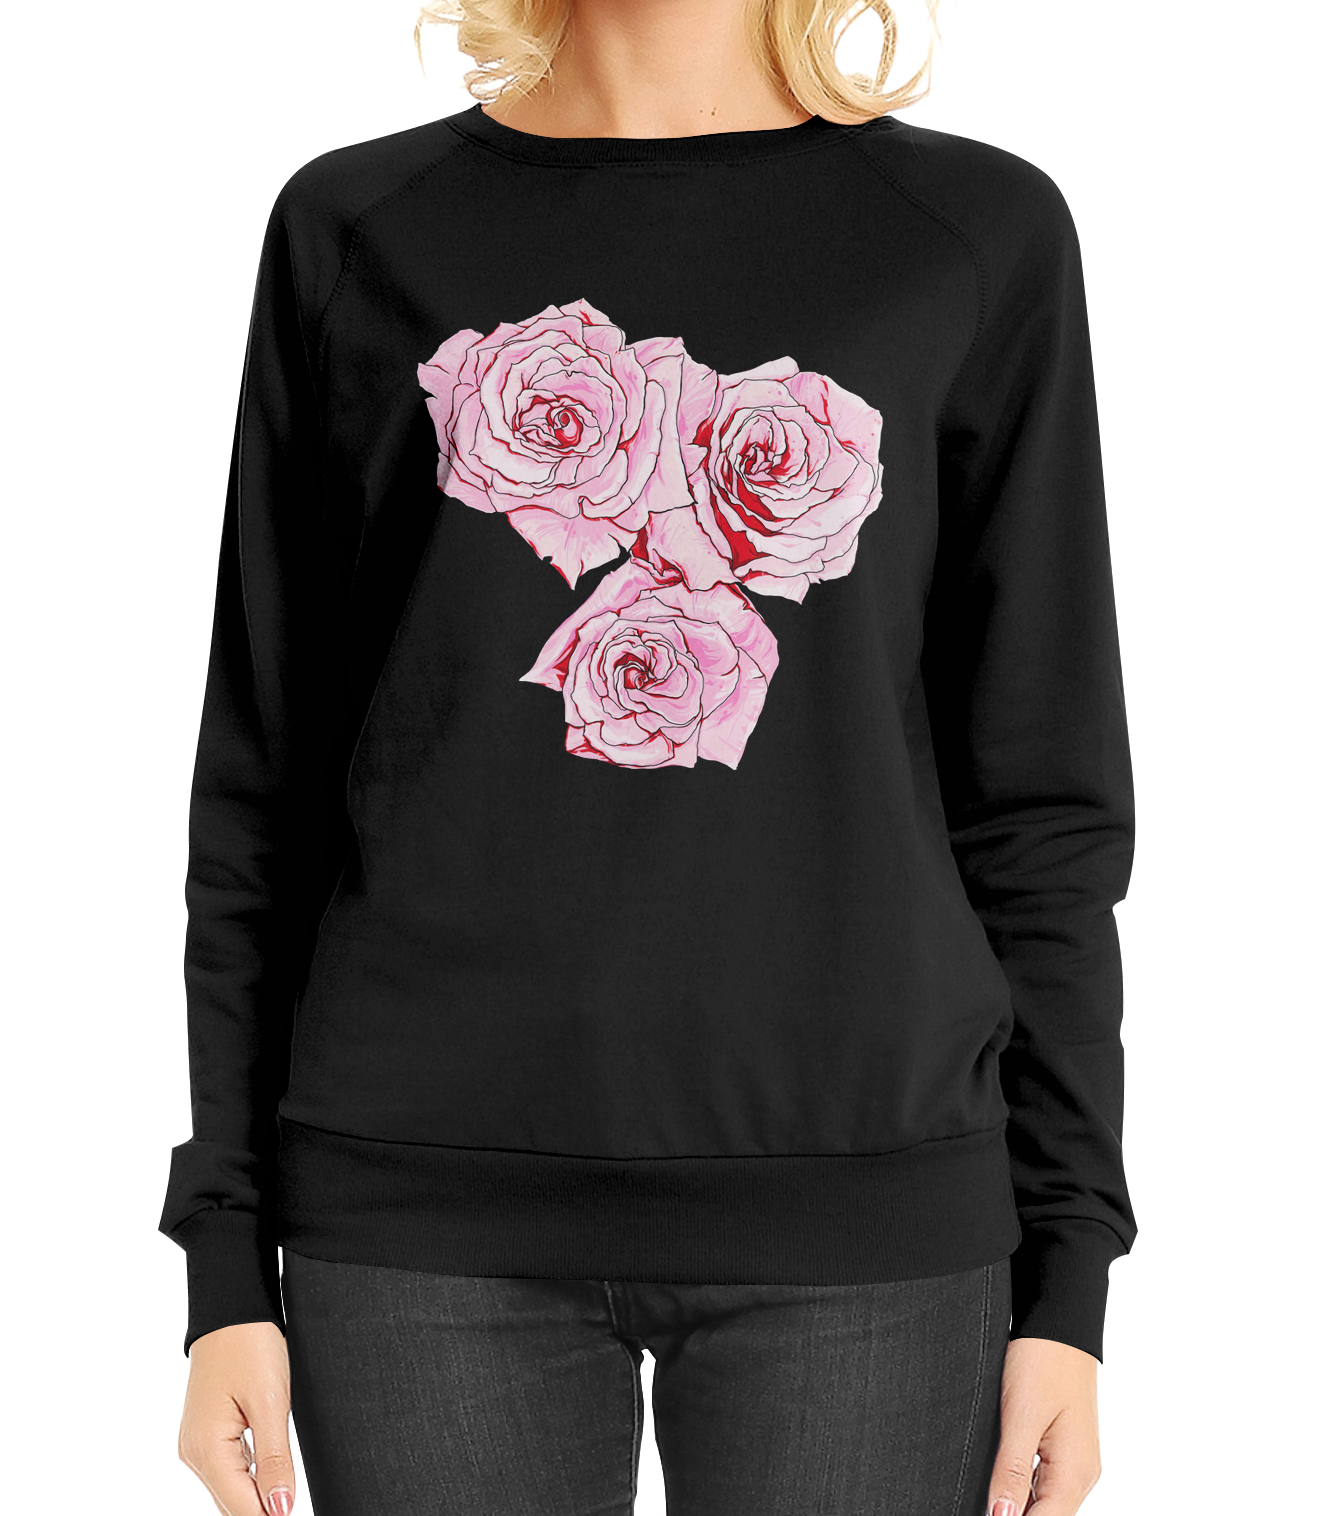 Pink roses print design by Sonia Nezvetaeva